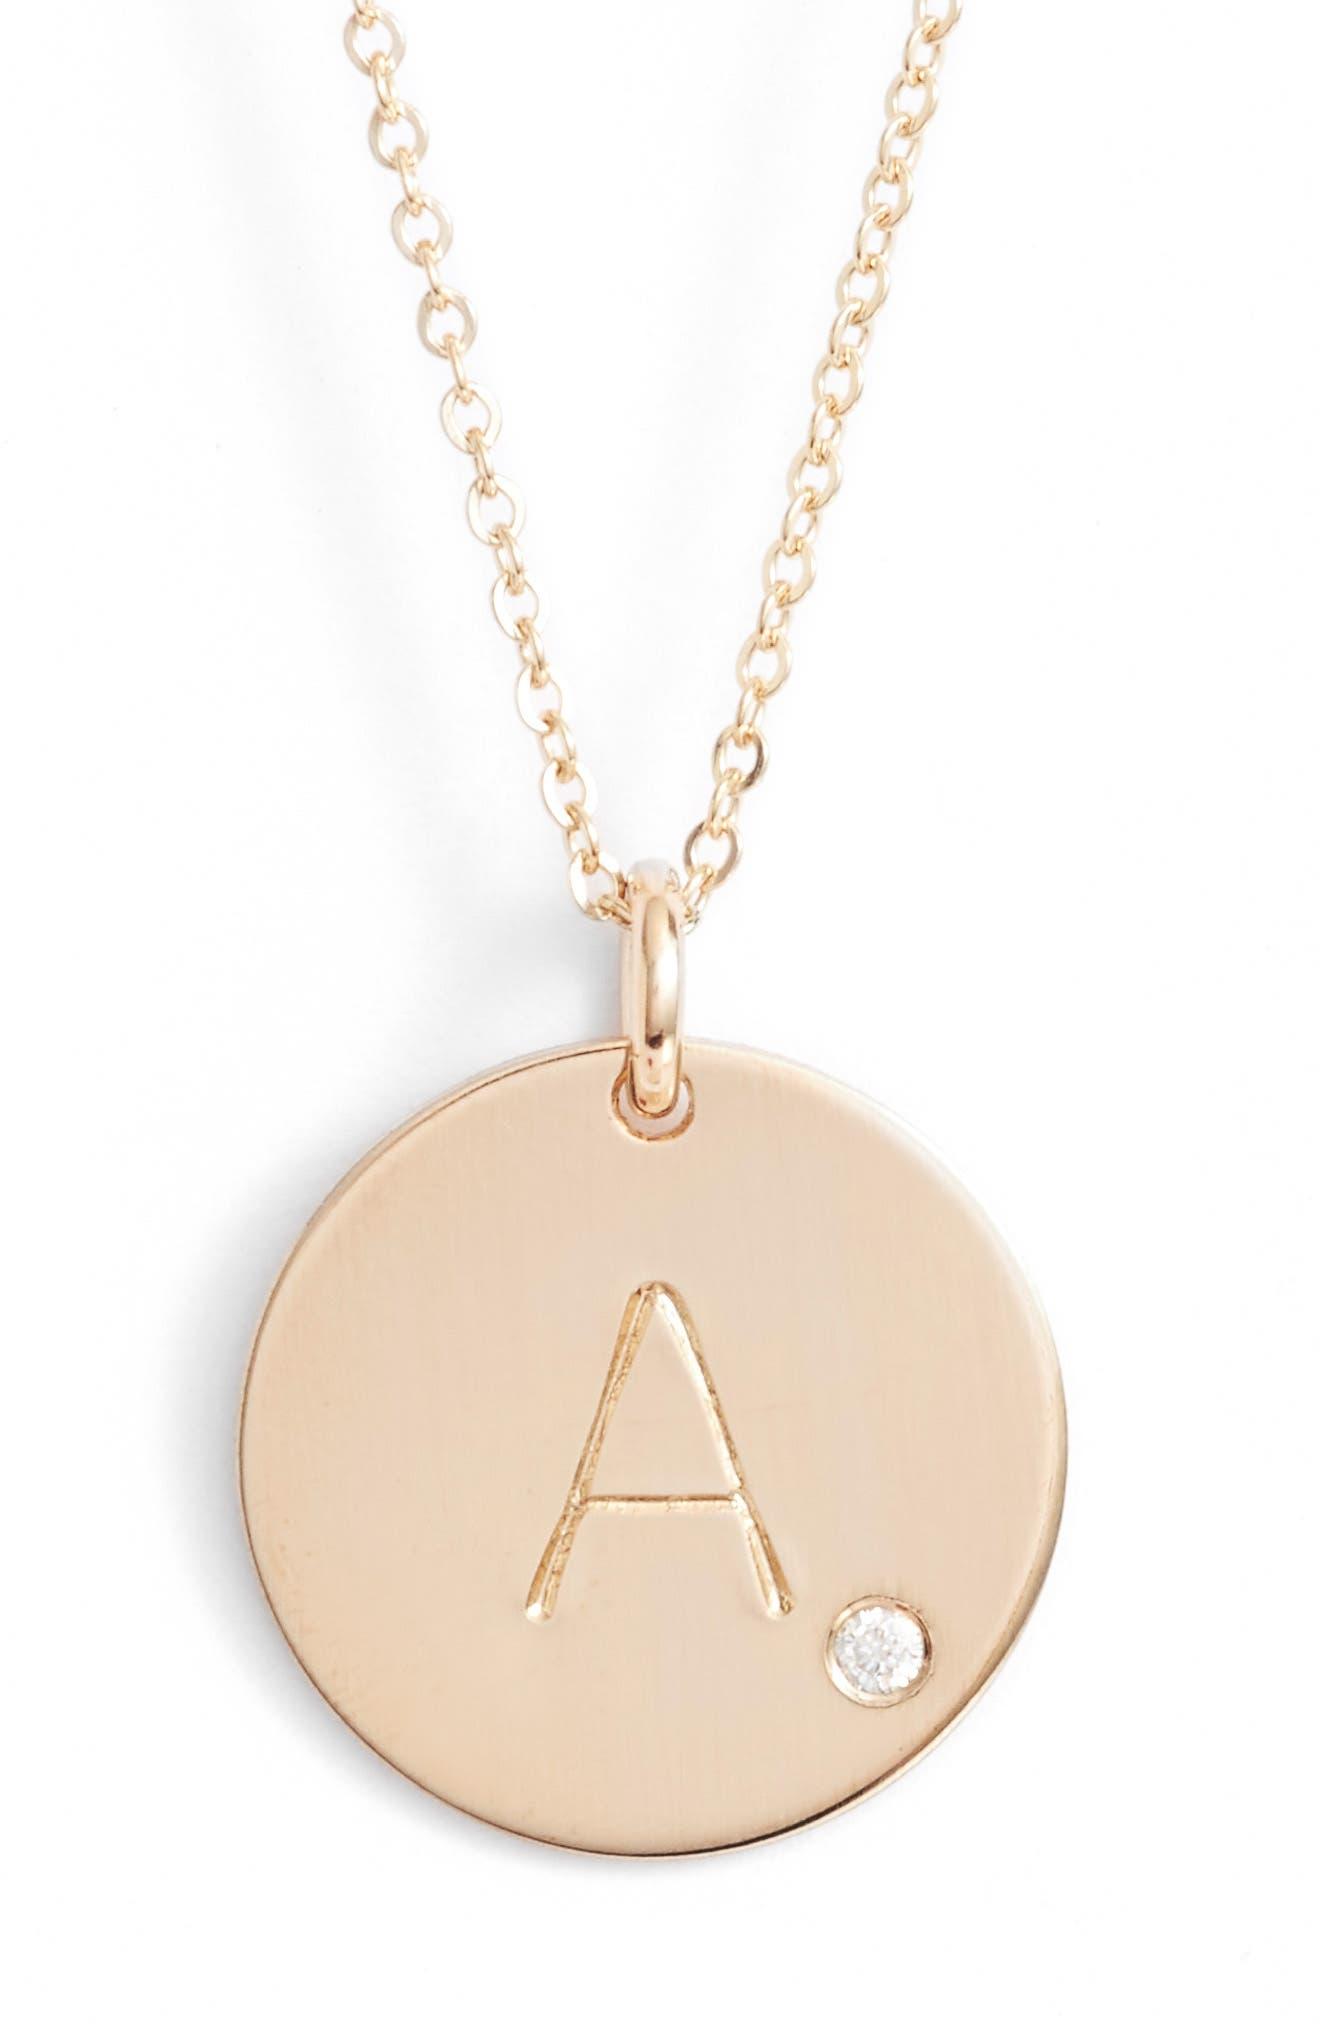 Diamond Initial Pendant Necklace,                             Main thumbnail 1, color,                             710